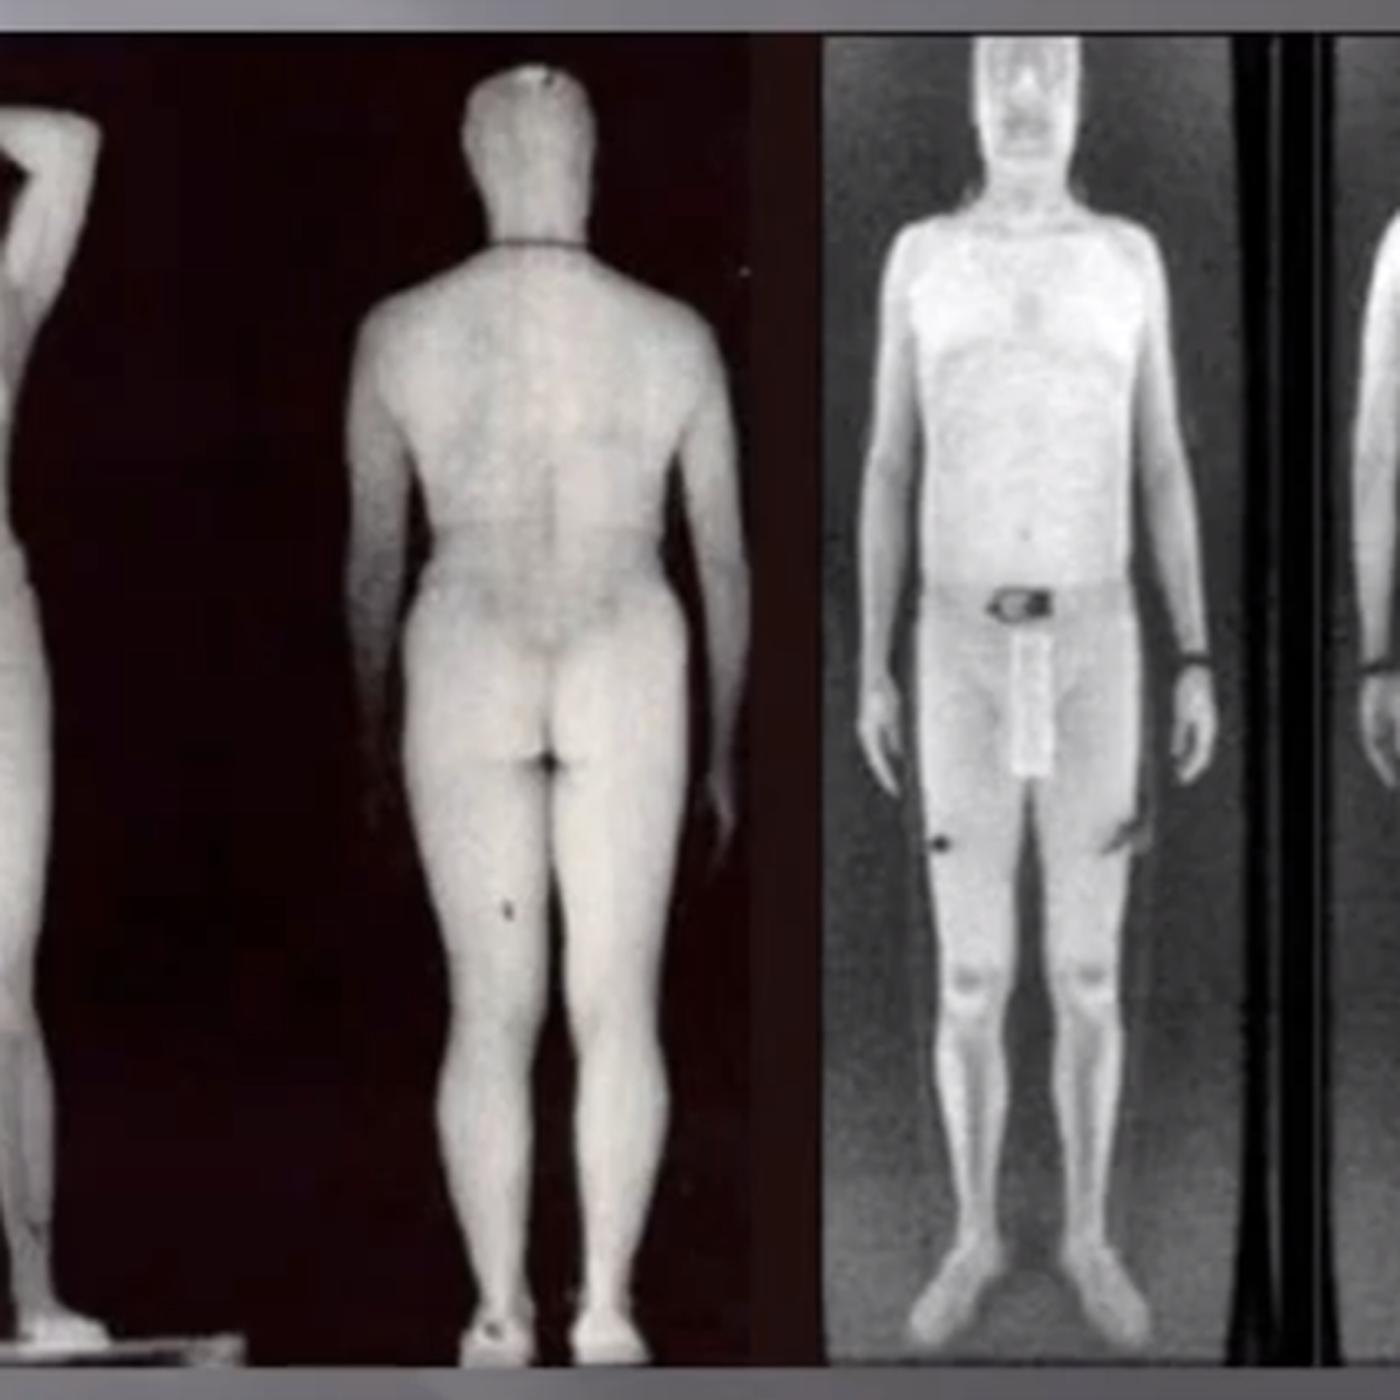 TSA's full-body scanners easily defeated by hidden pockets